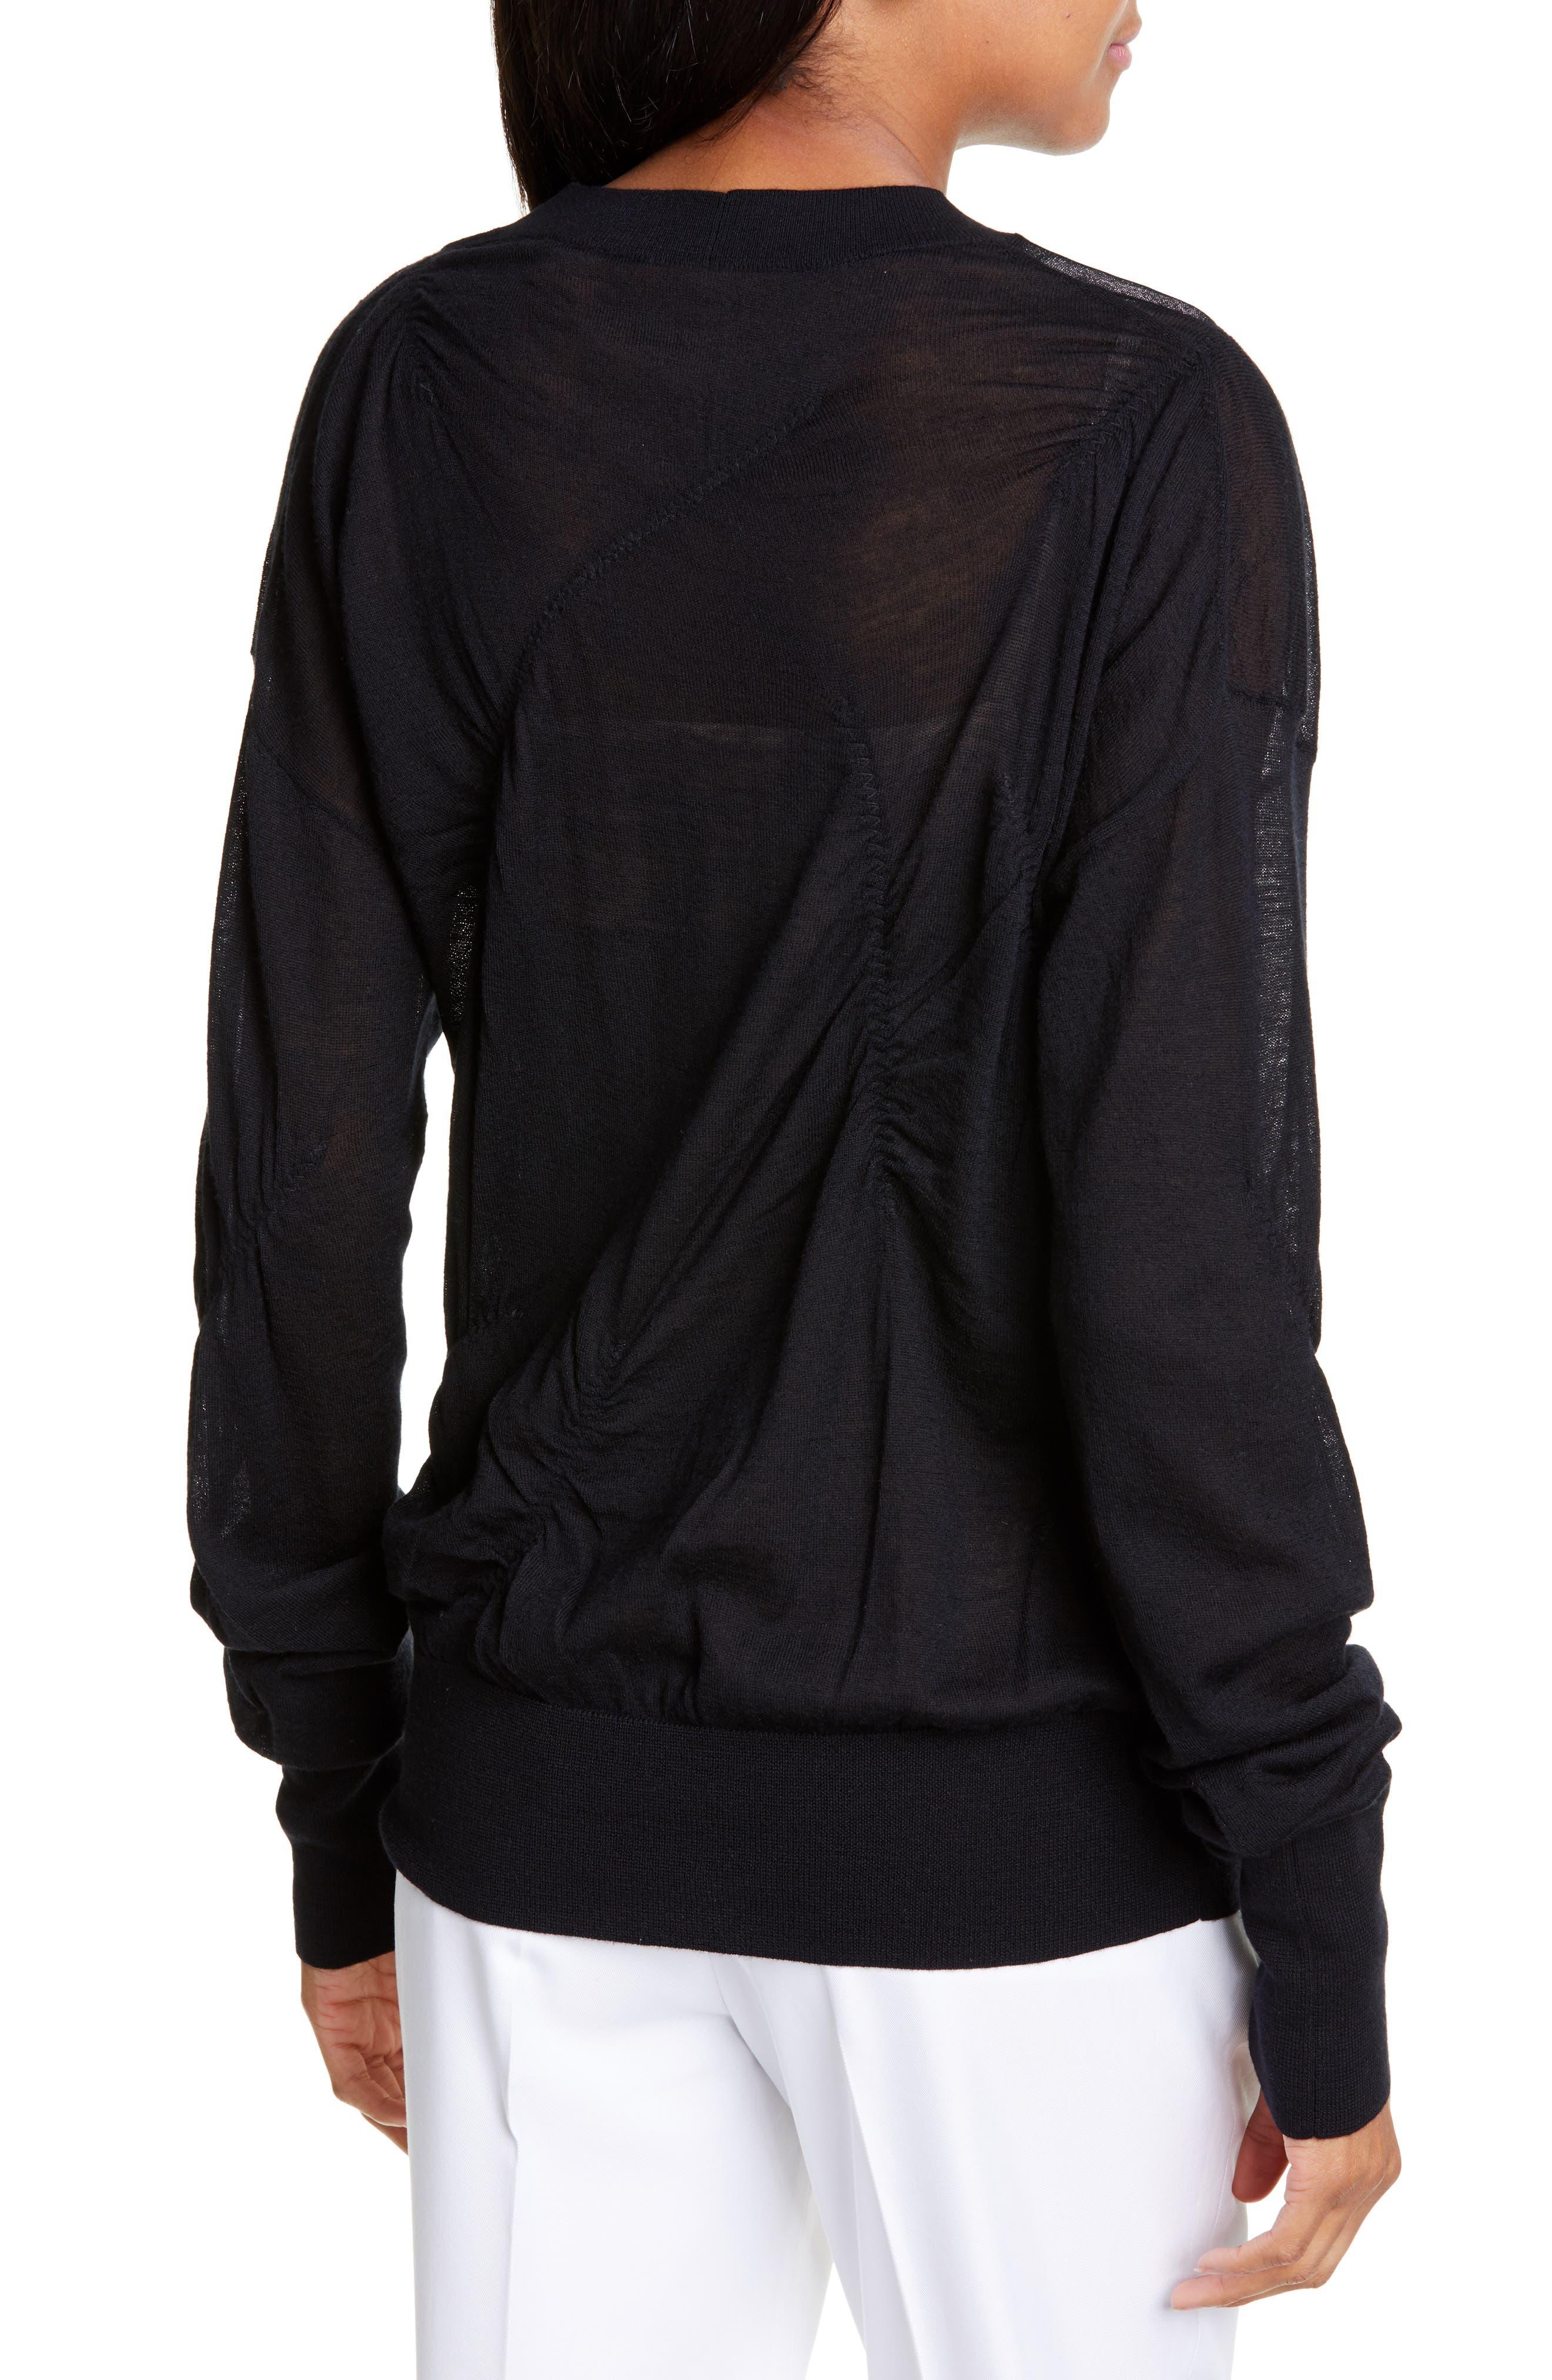 HELMUT LANG, Ruched Seam Detail Cashmere Sweater, Alternate thumbnail 2, color, BLACK